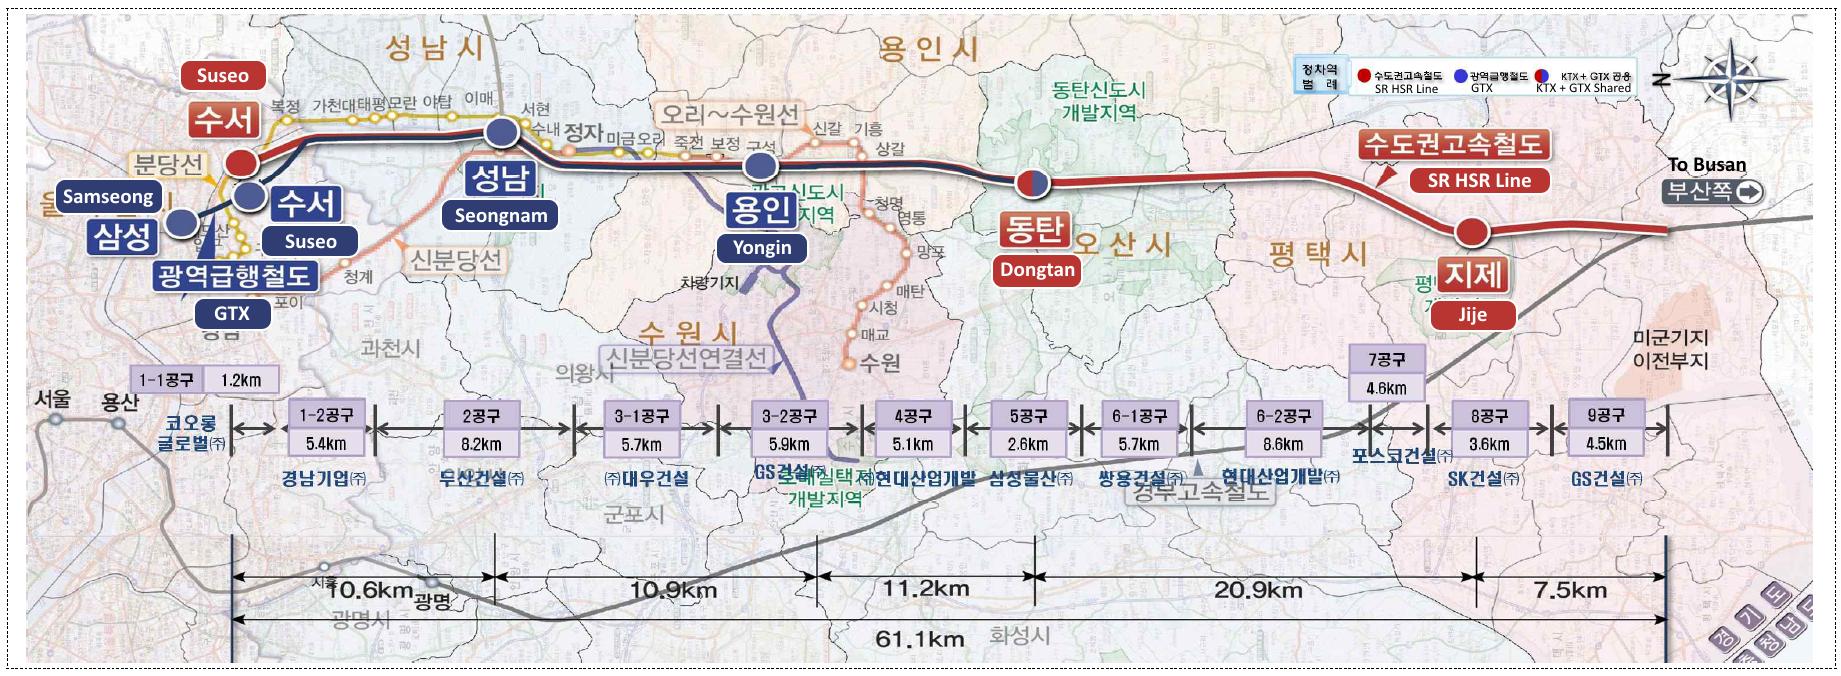 HSR Map